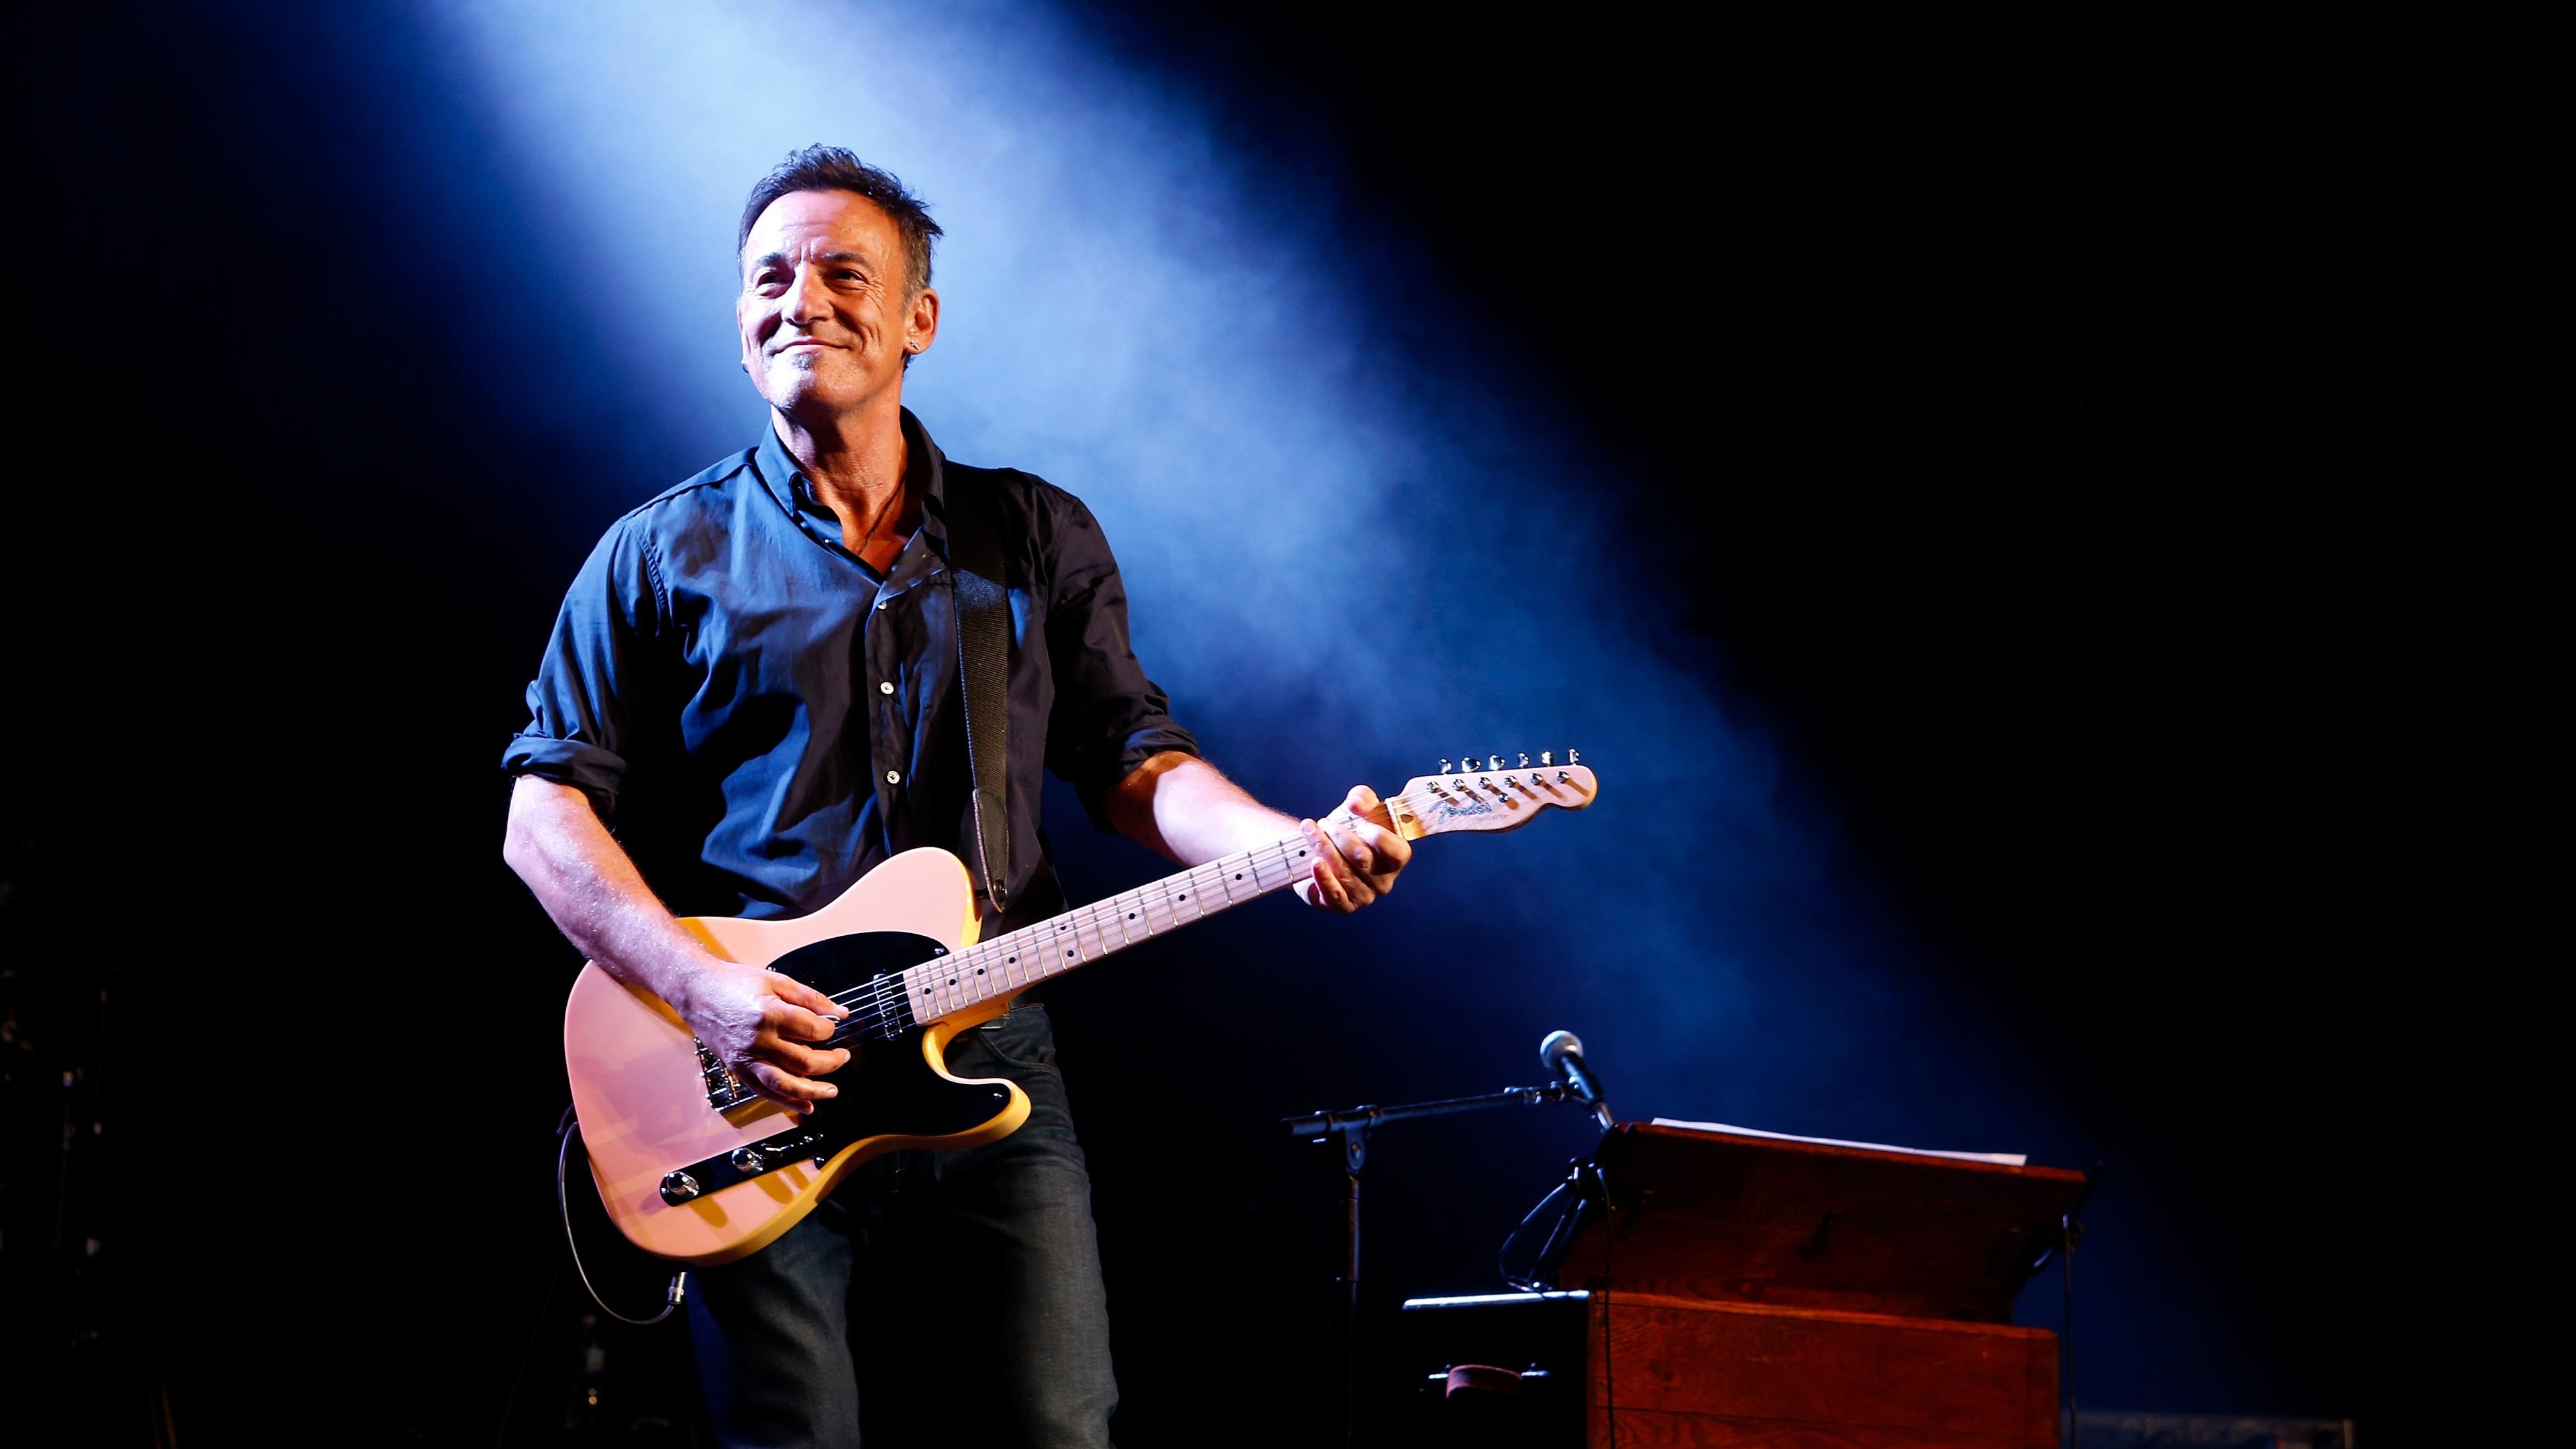 15 Covers al Jefe Bruce Springsteen